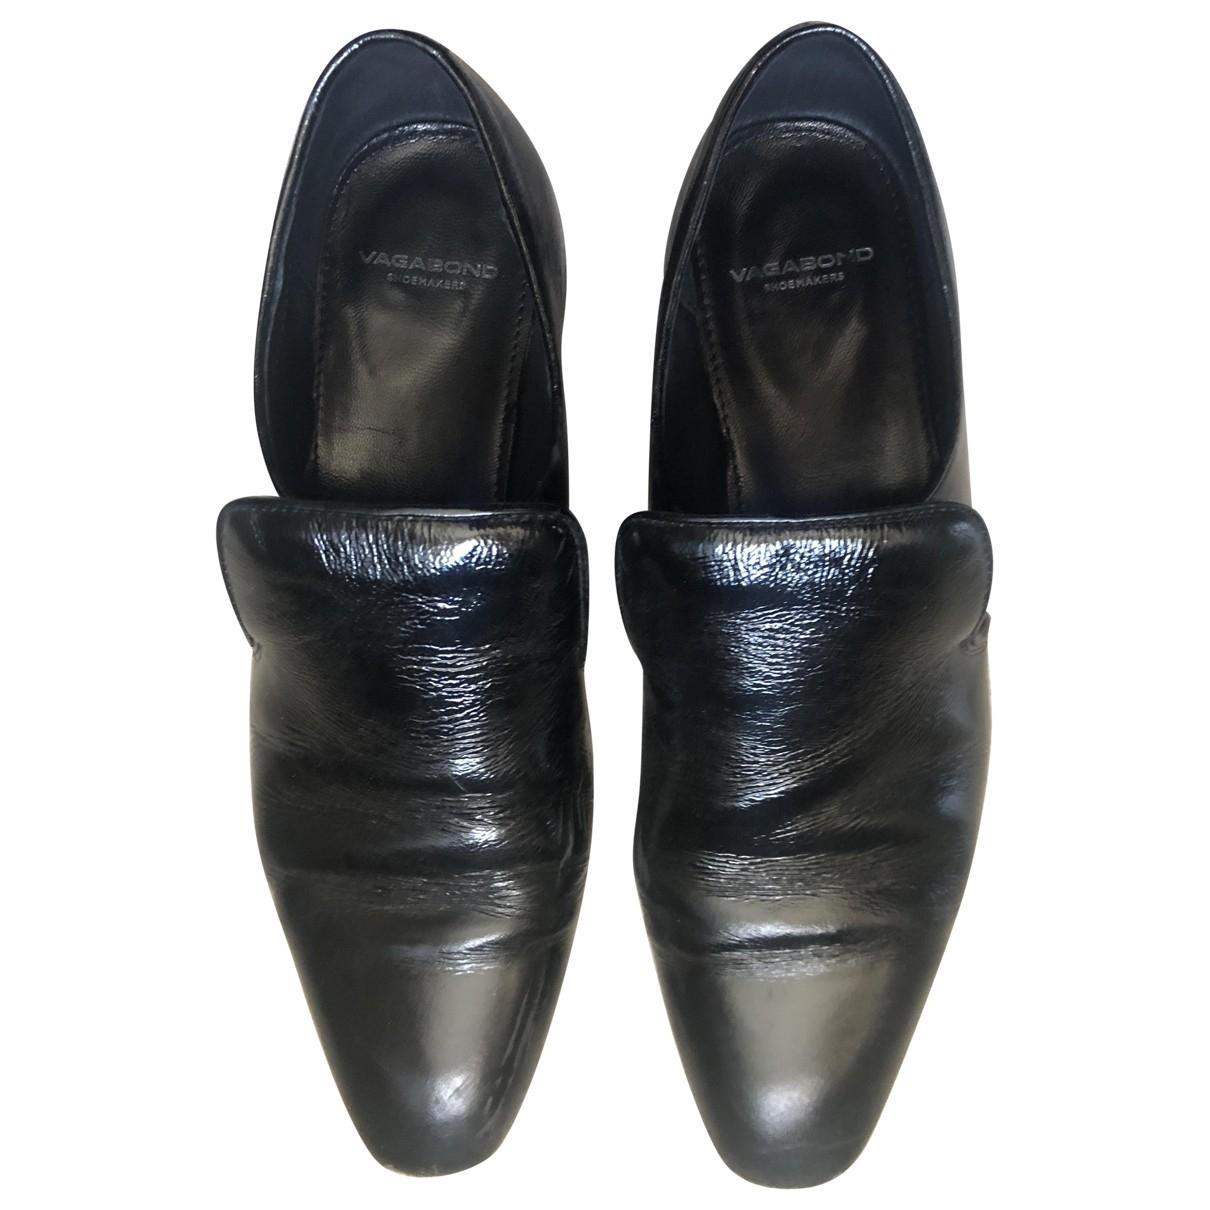 Vagabond \N Black Patent leather Flats for Women 39 EU